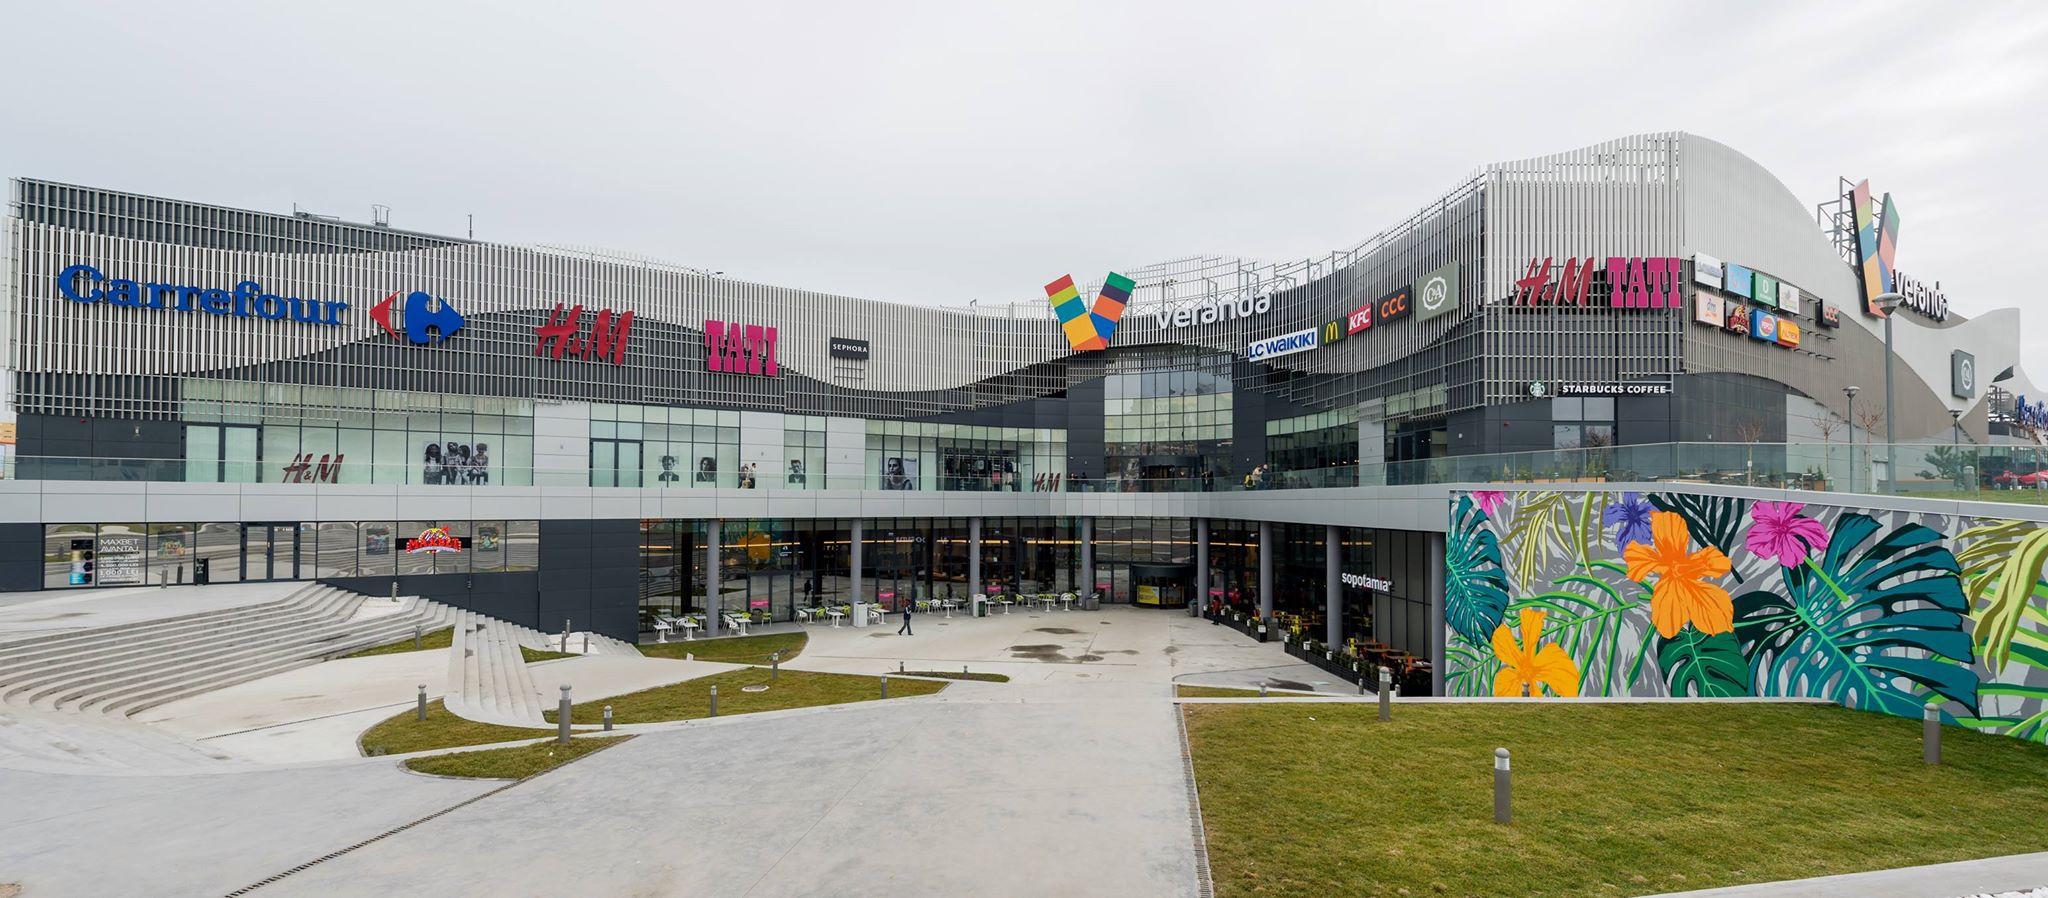 Centrul comercial Veranda din zona Bucur Obor a mai atras trei chiriaşi noi